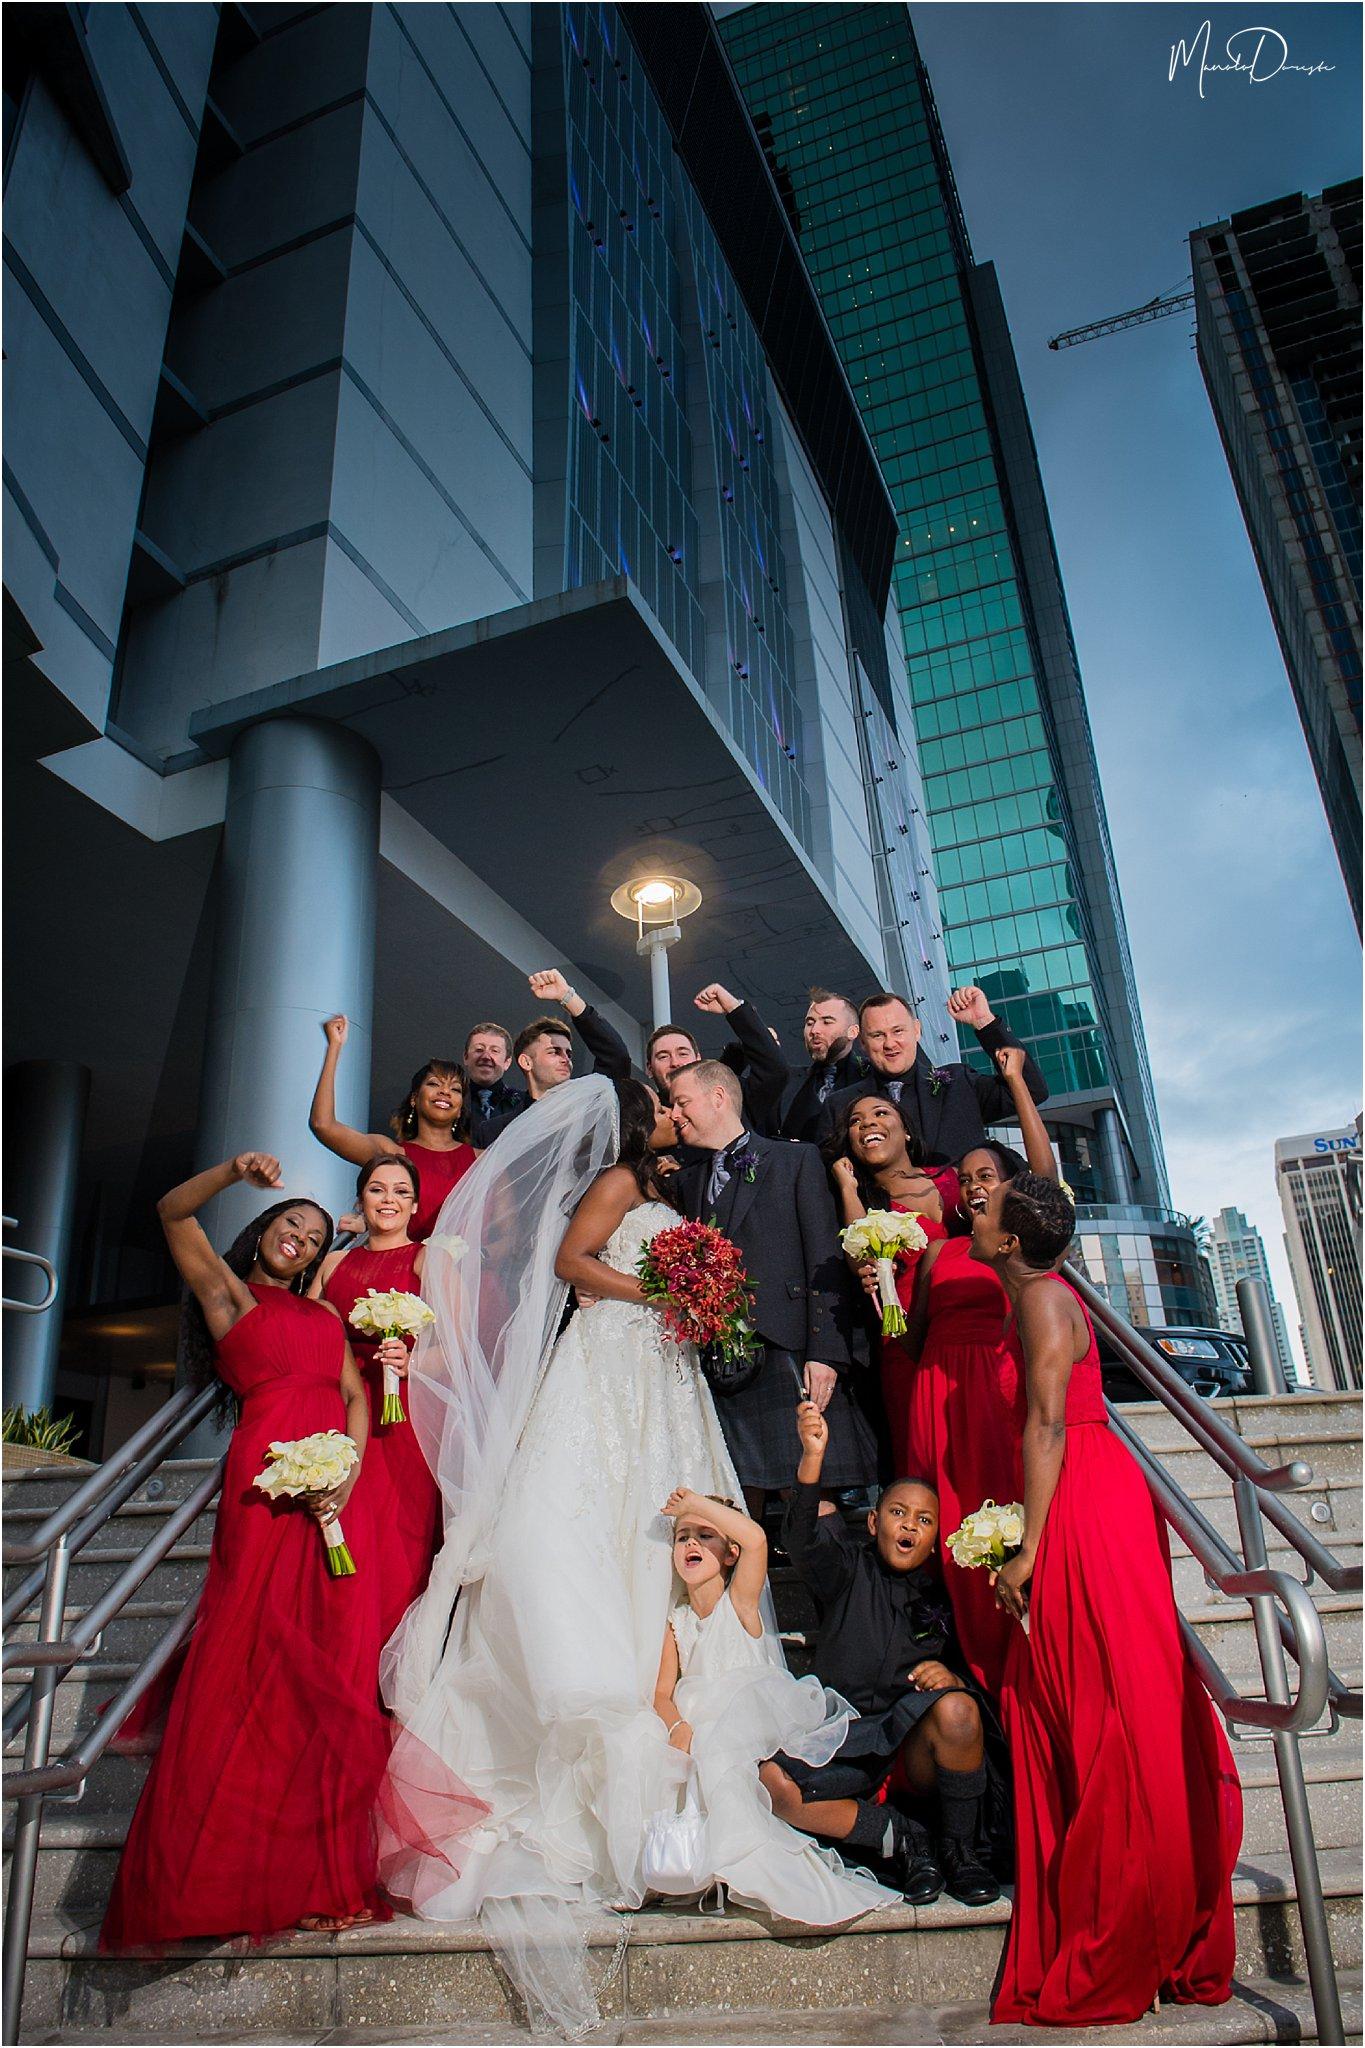 0123_ManoloDoreste_InFocusStudios_Wedding_Family_Photography_Miami_MiamiPhotographer.jpg